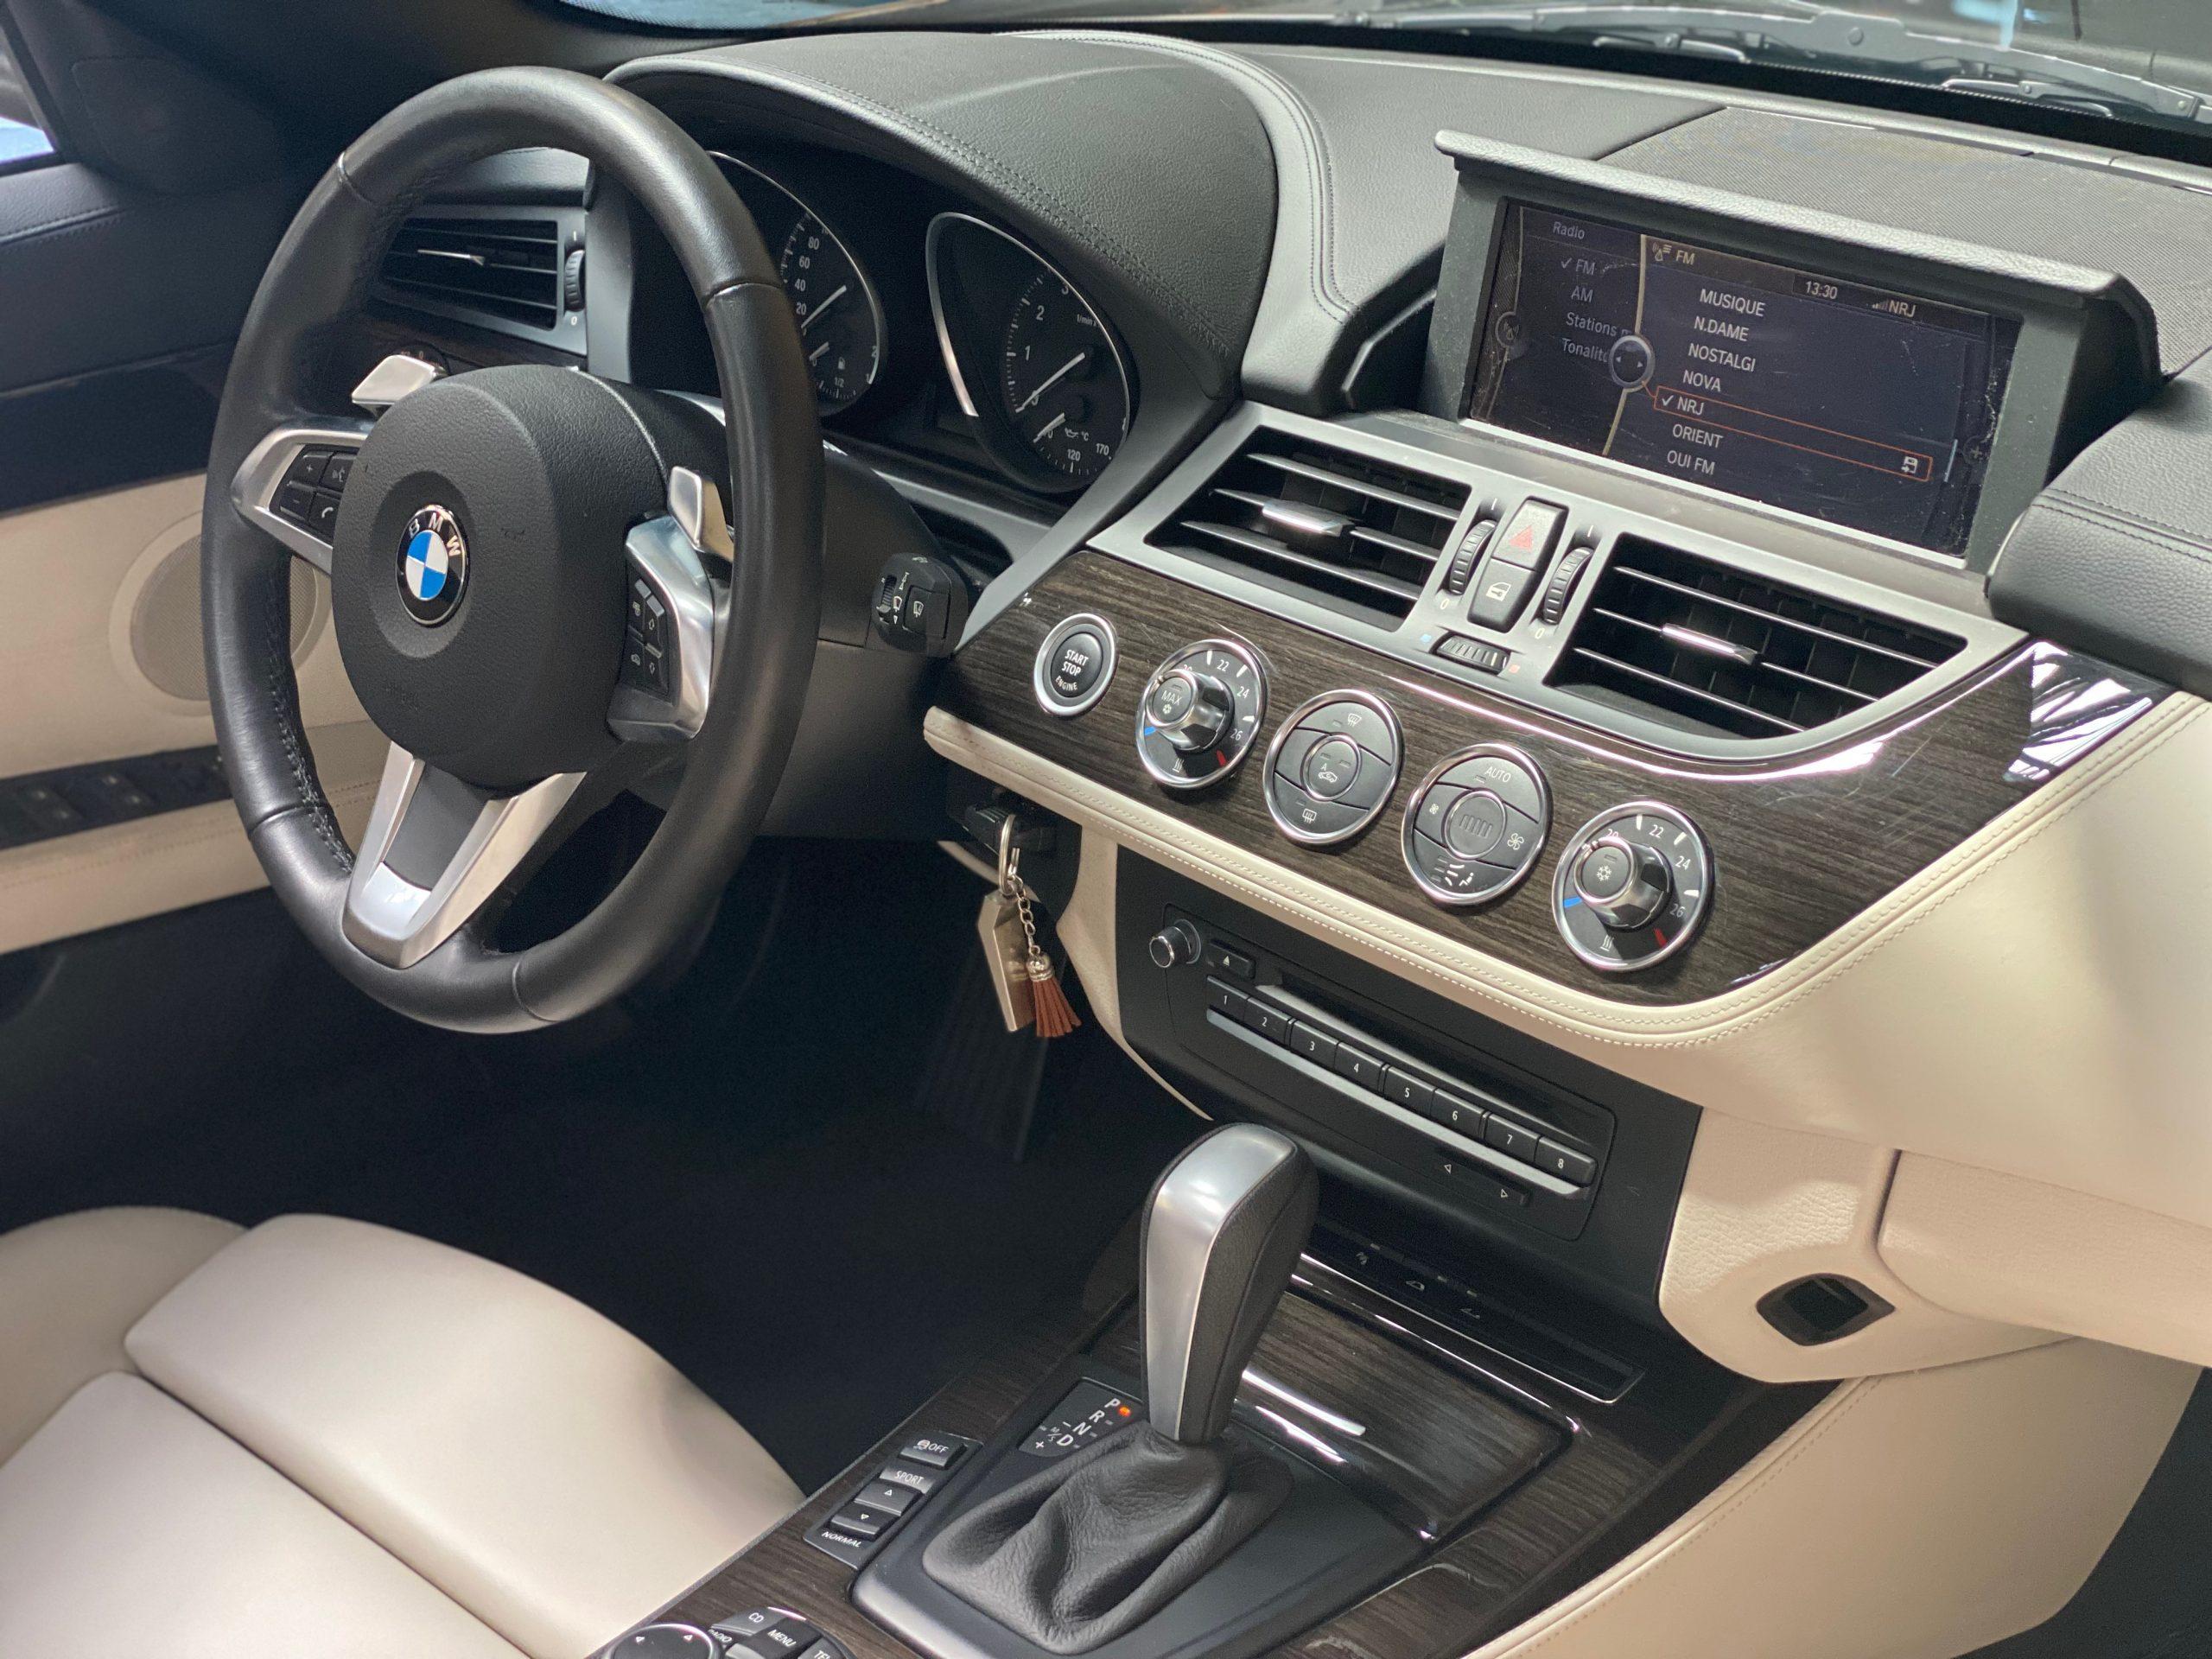 BMW Z4 sDrive 3.0iA Luxe Roadster